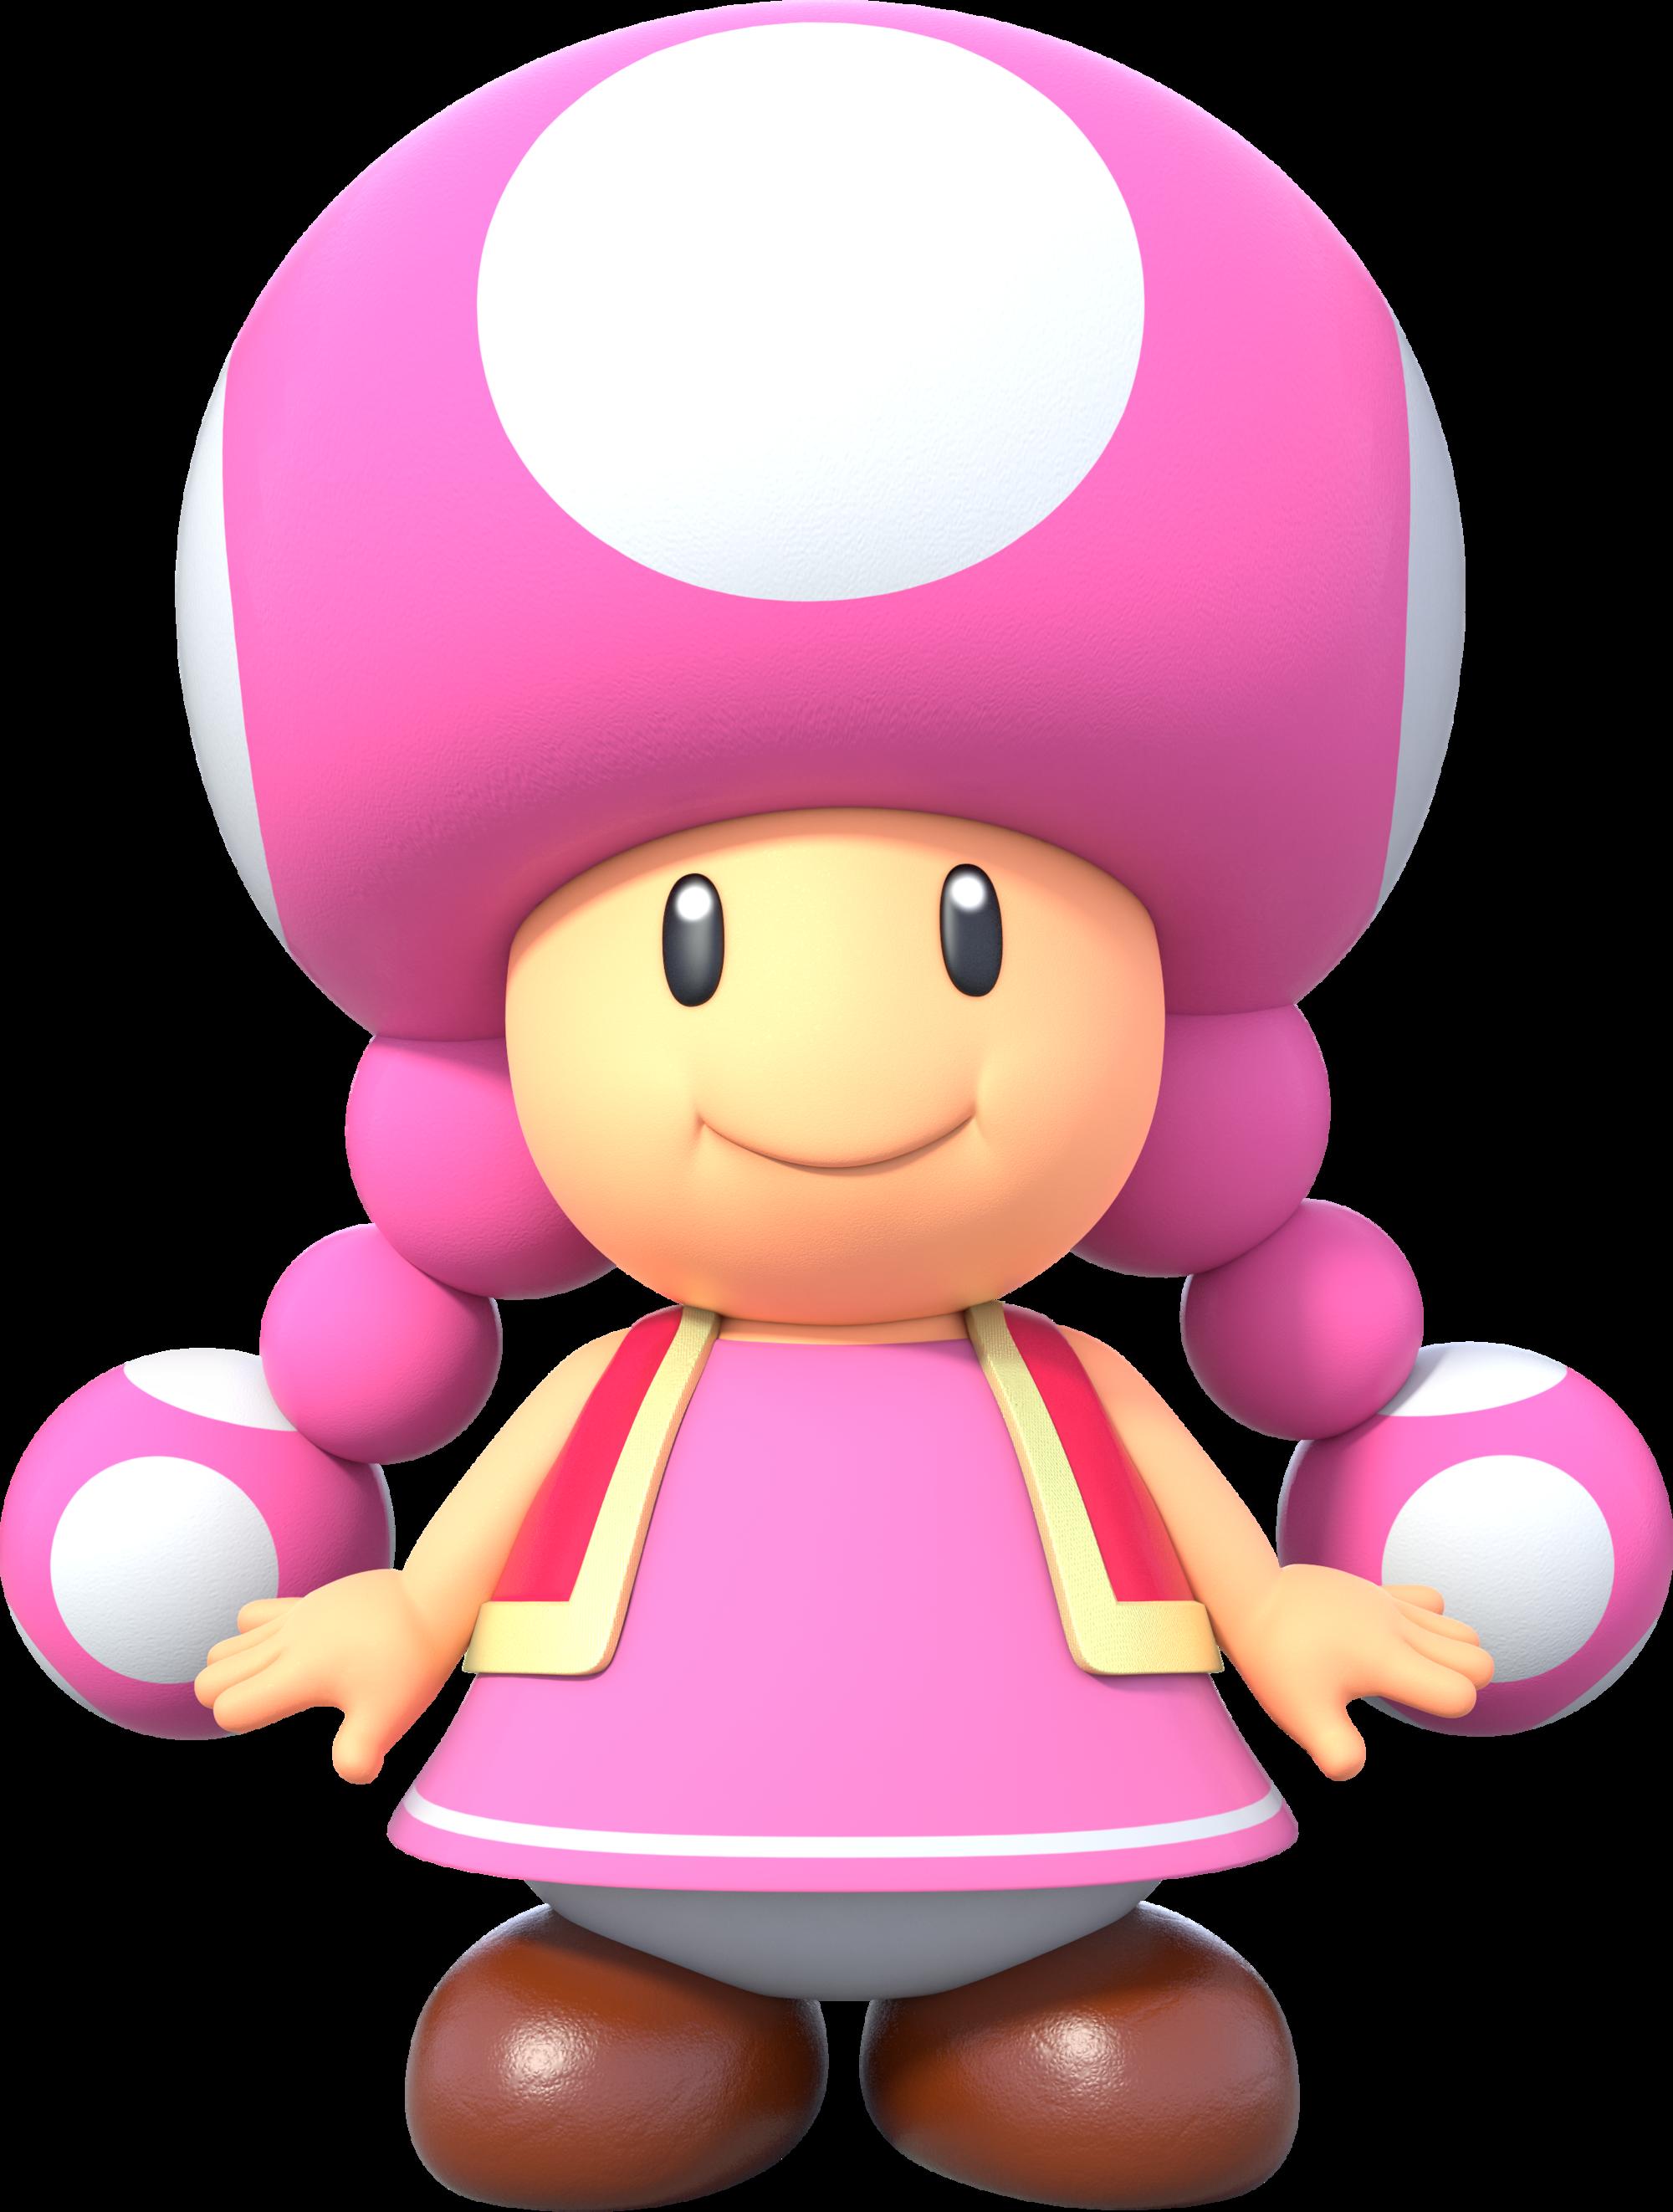 Toadette In 2020 Mario Kart Mario Bros Mario Kart Characters